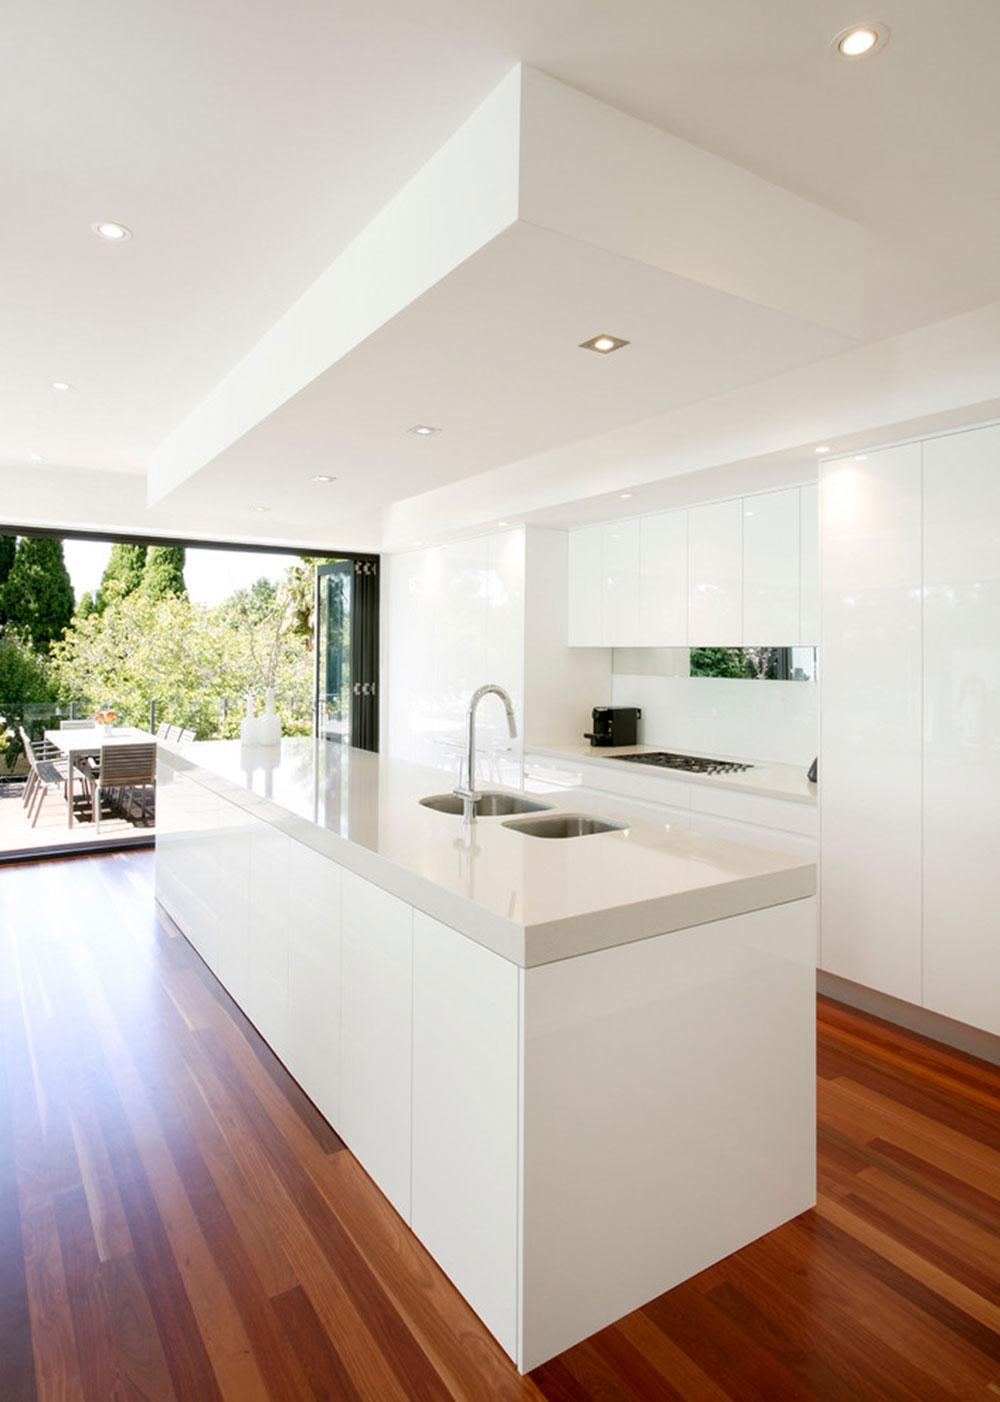 Showcase Of Beautiful And Overwhelming Large Luxury Kitchens8 Large